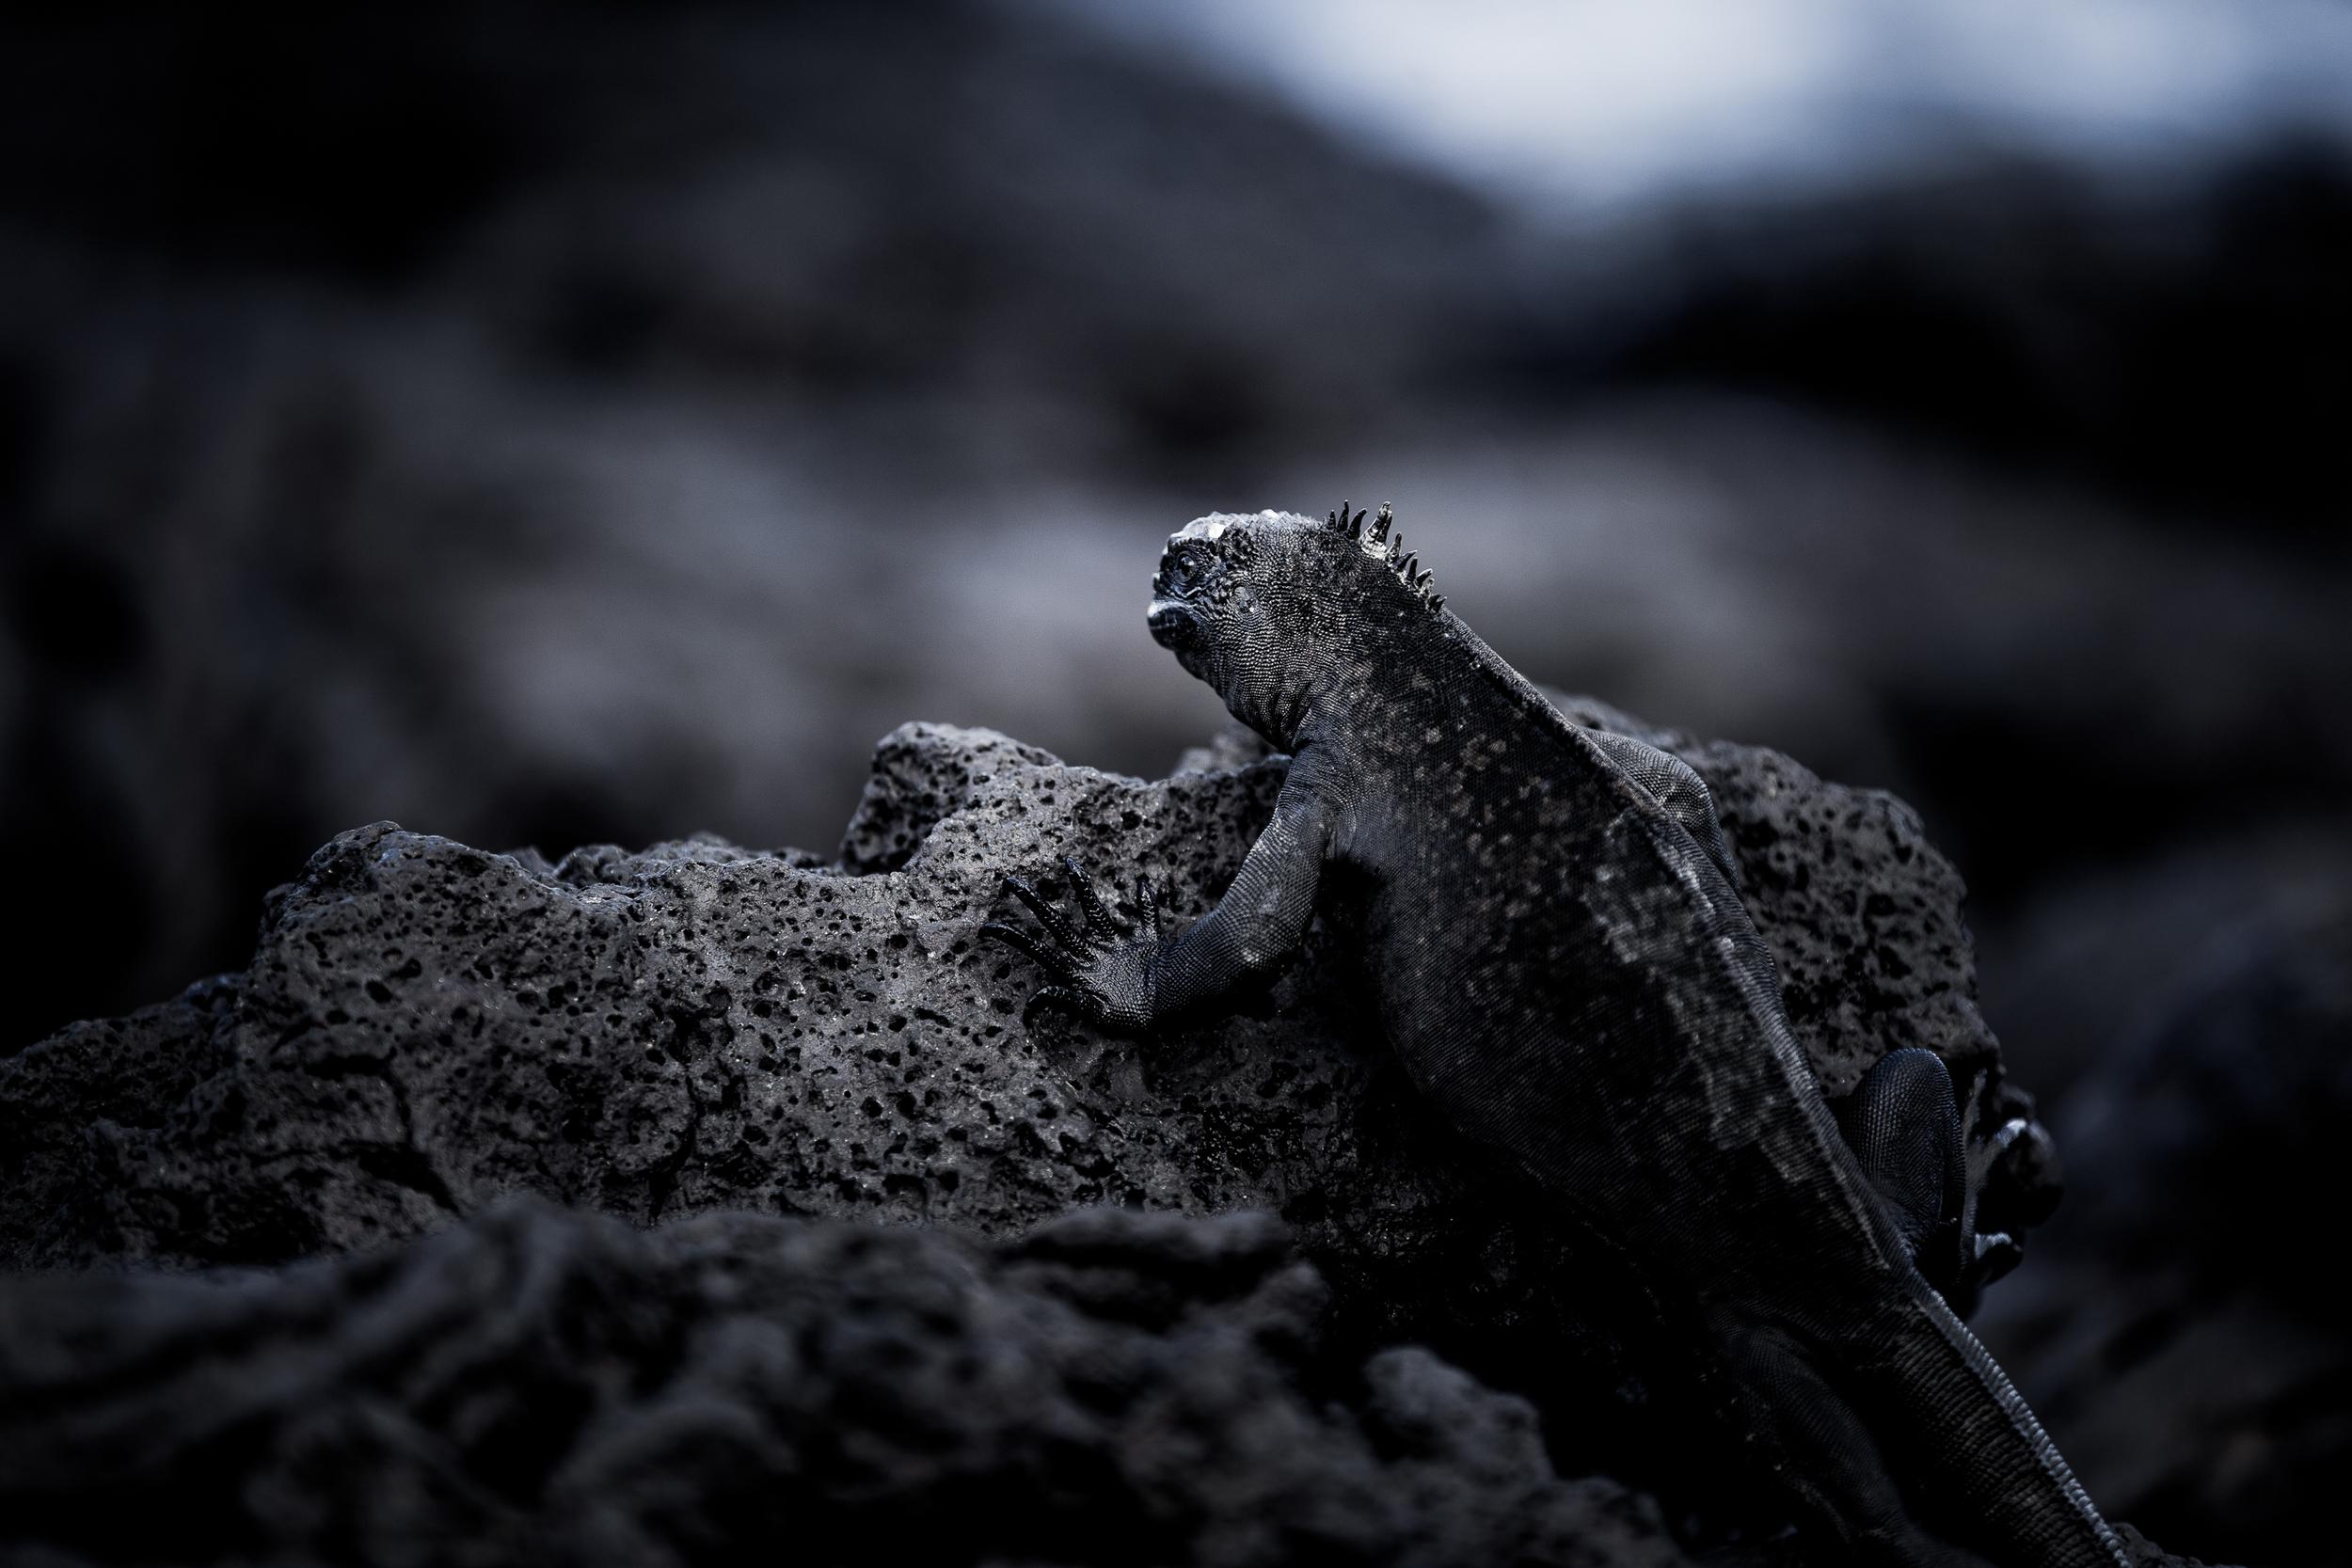 Iguane marin - Iles des Galapagos - Equateur